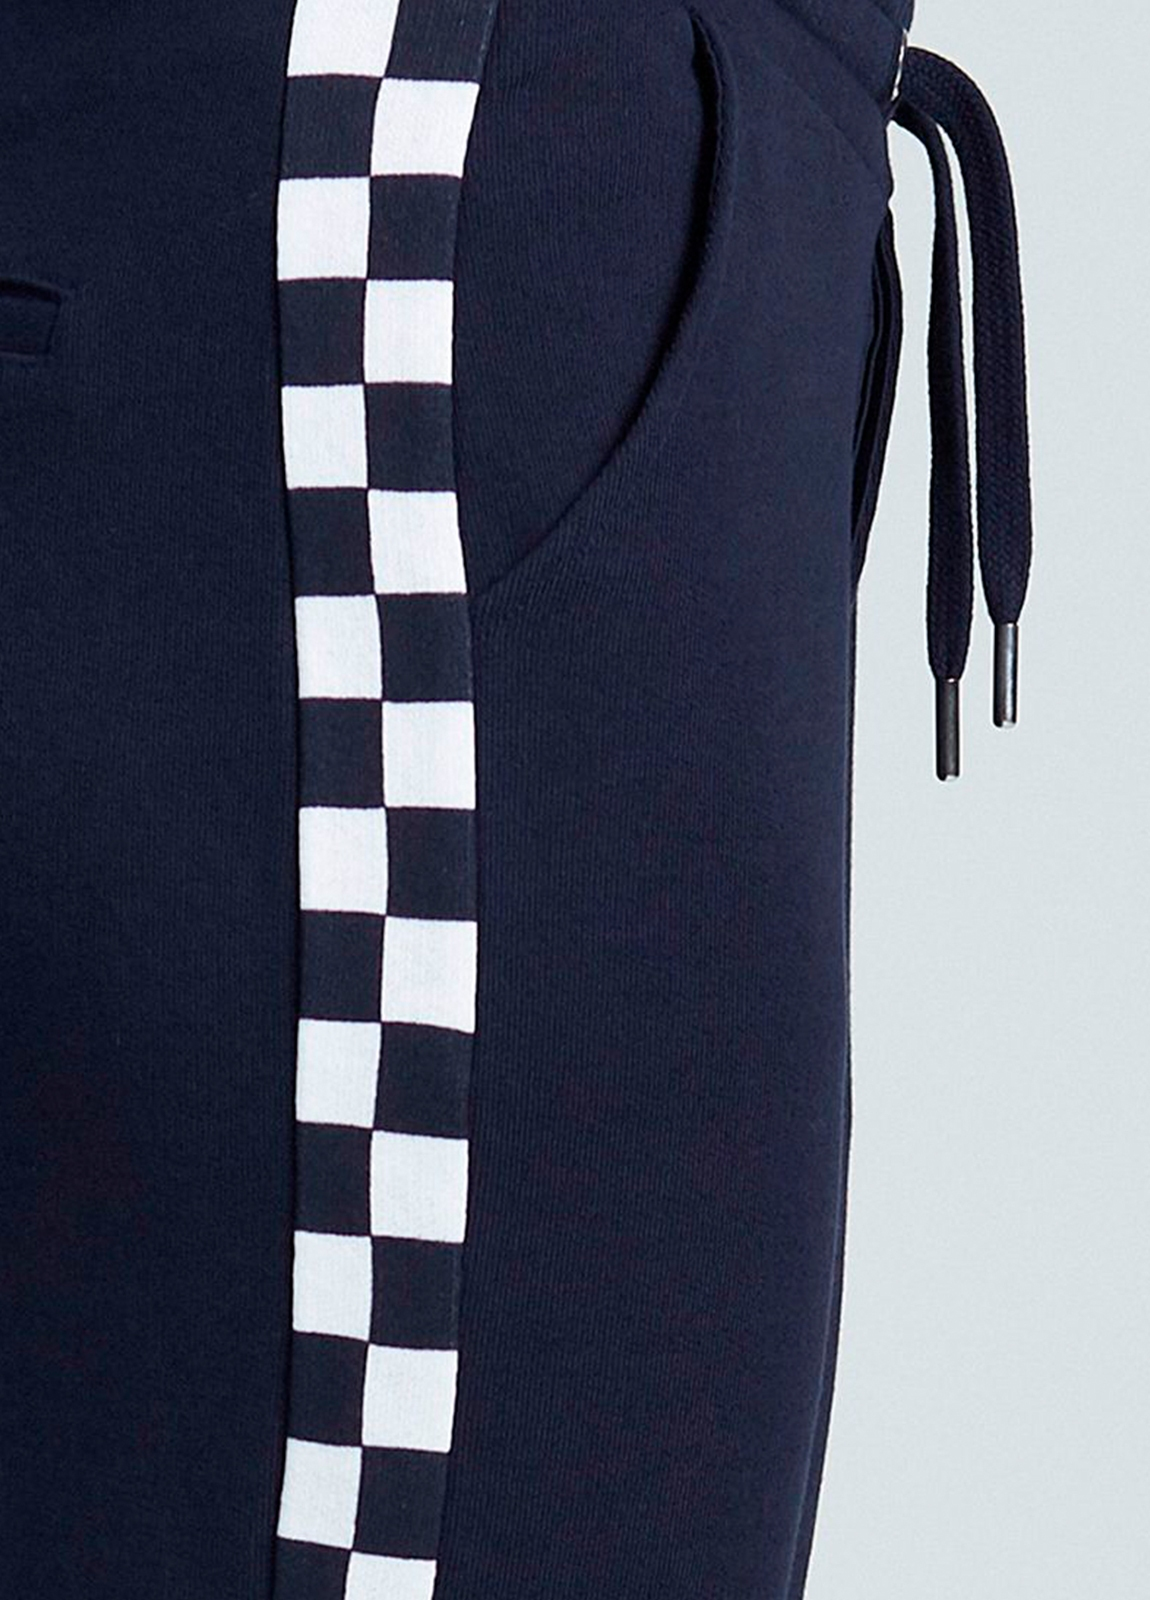 Pantalón jogging relaxed fit color negro con dibujo lateral geométrico. 80% Algodón 20% Poliéster. - Ítem2